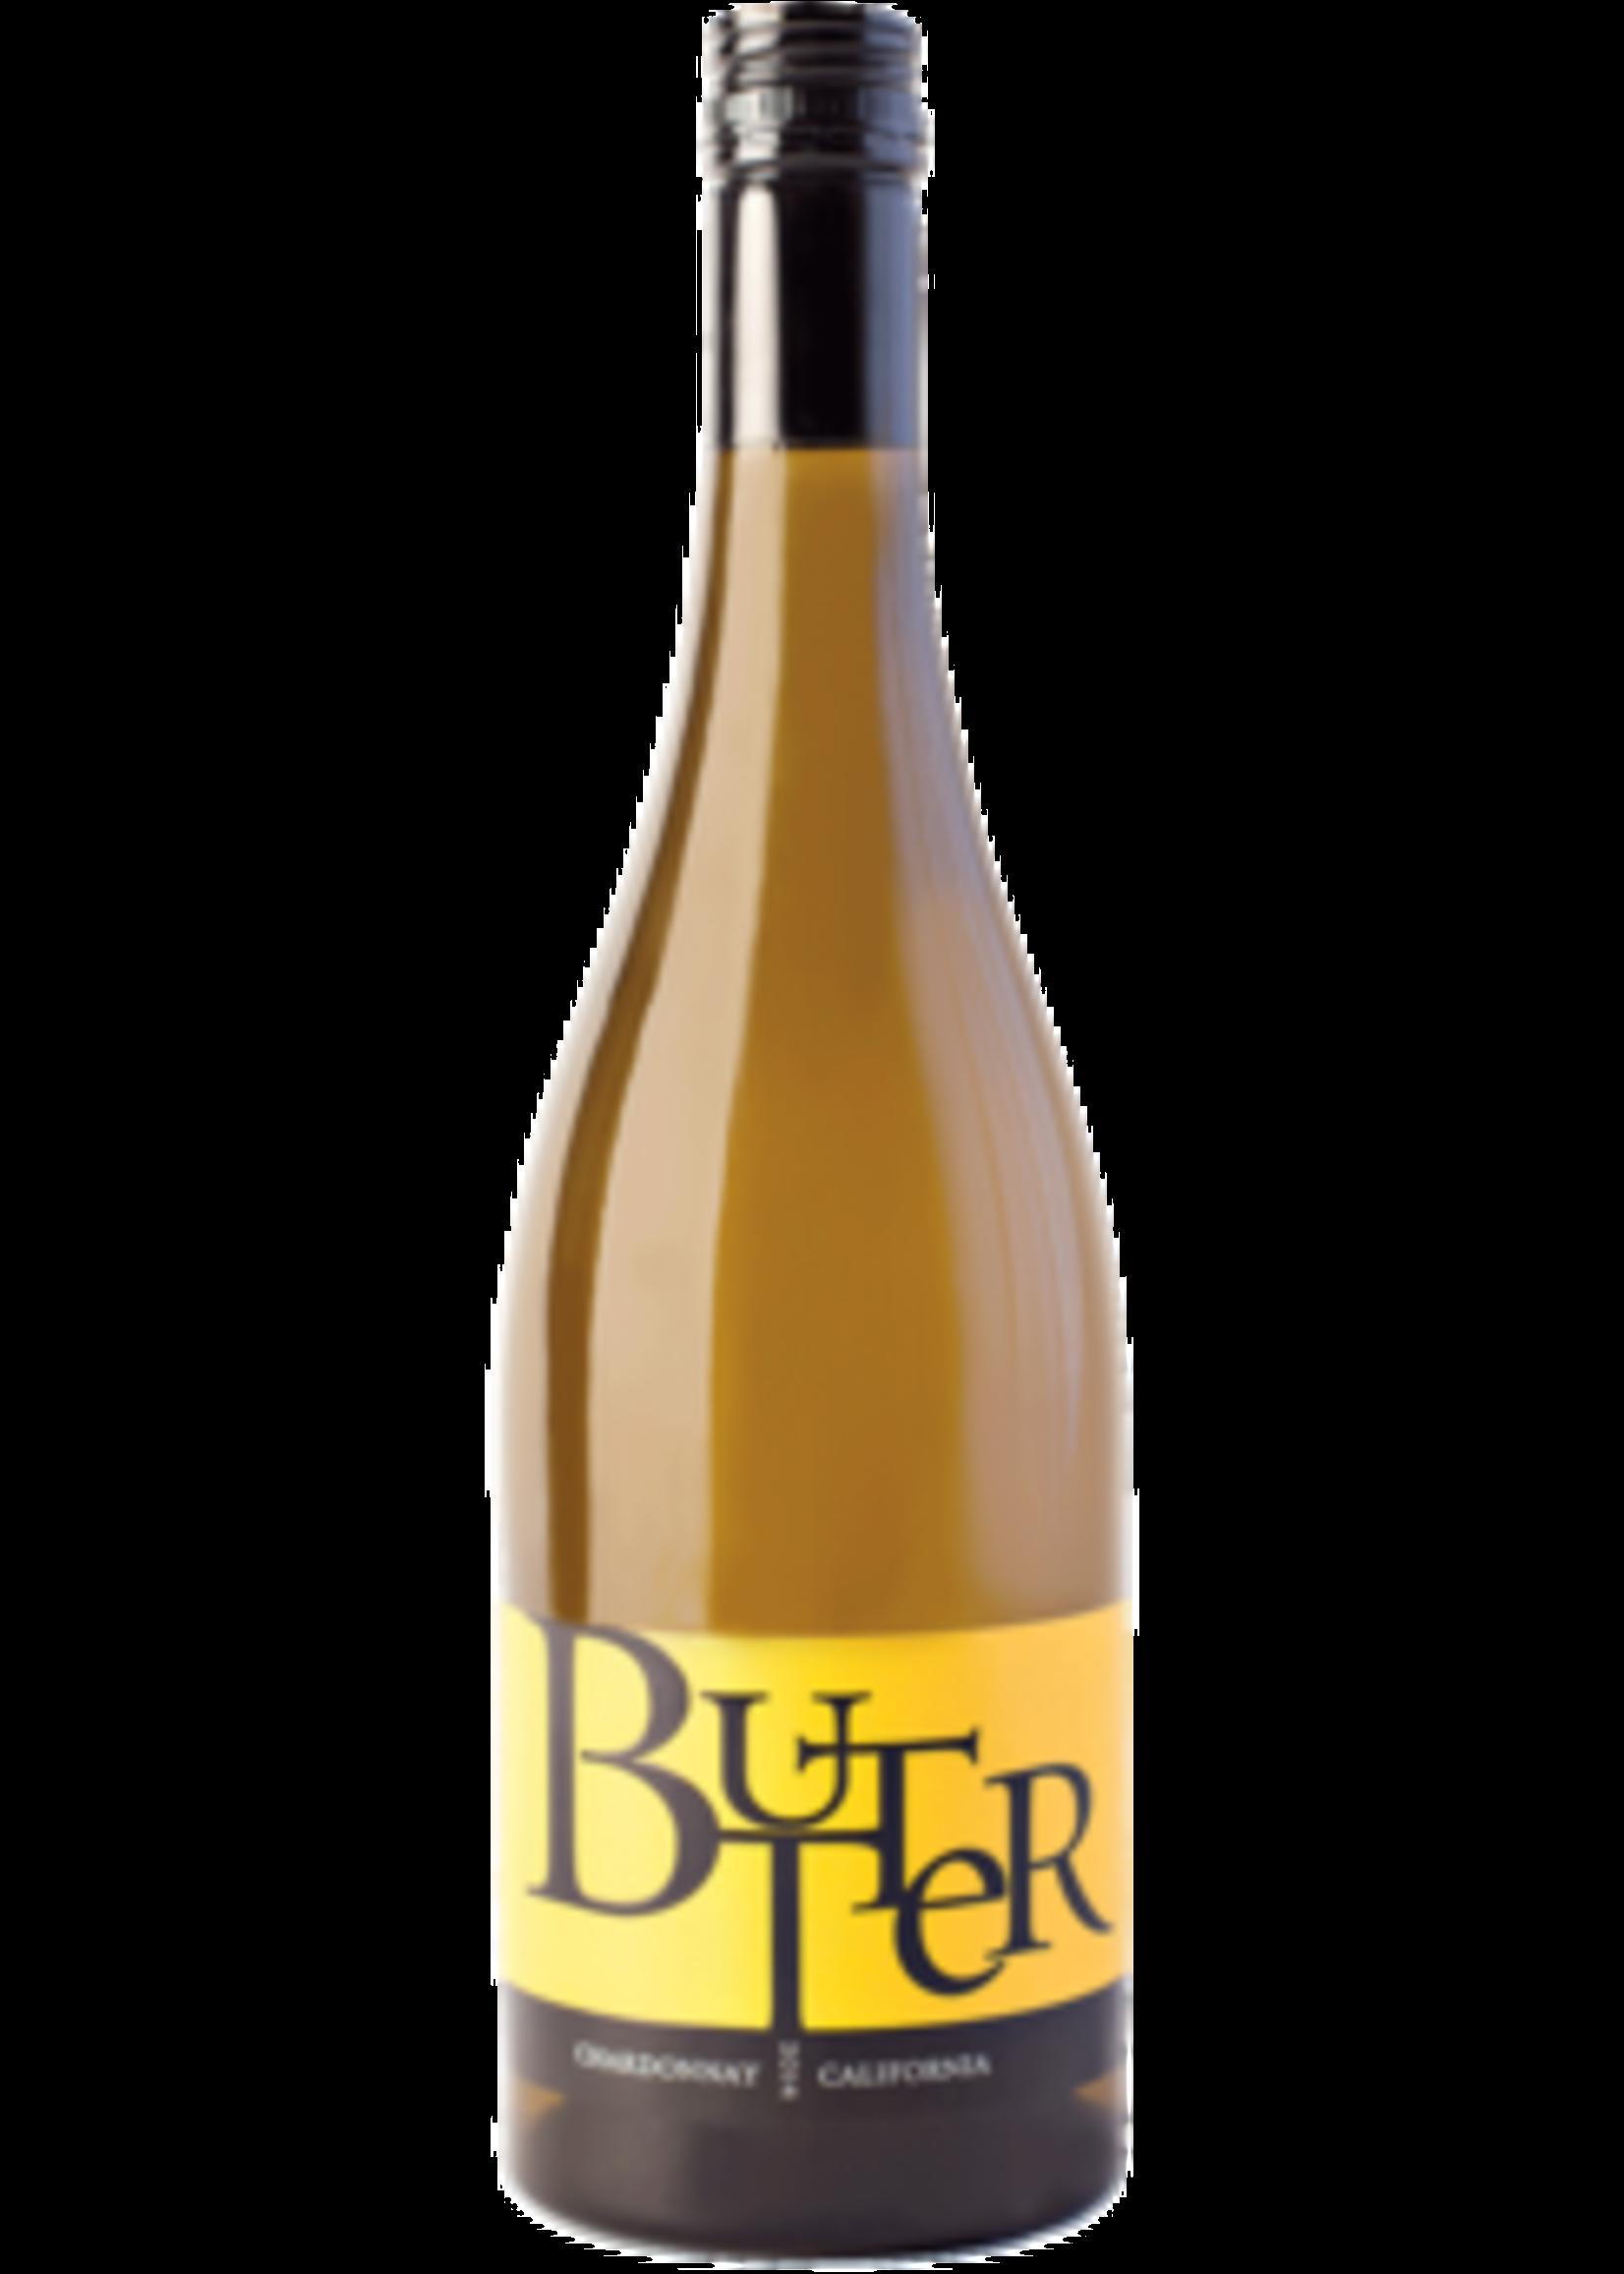 Jam Cellars Butter / Chardonnay / 750mL